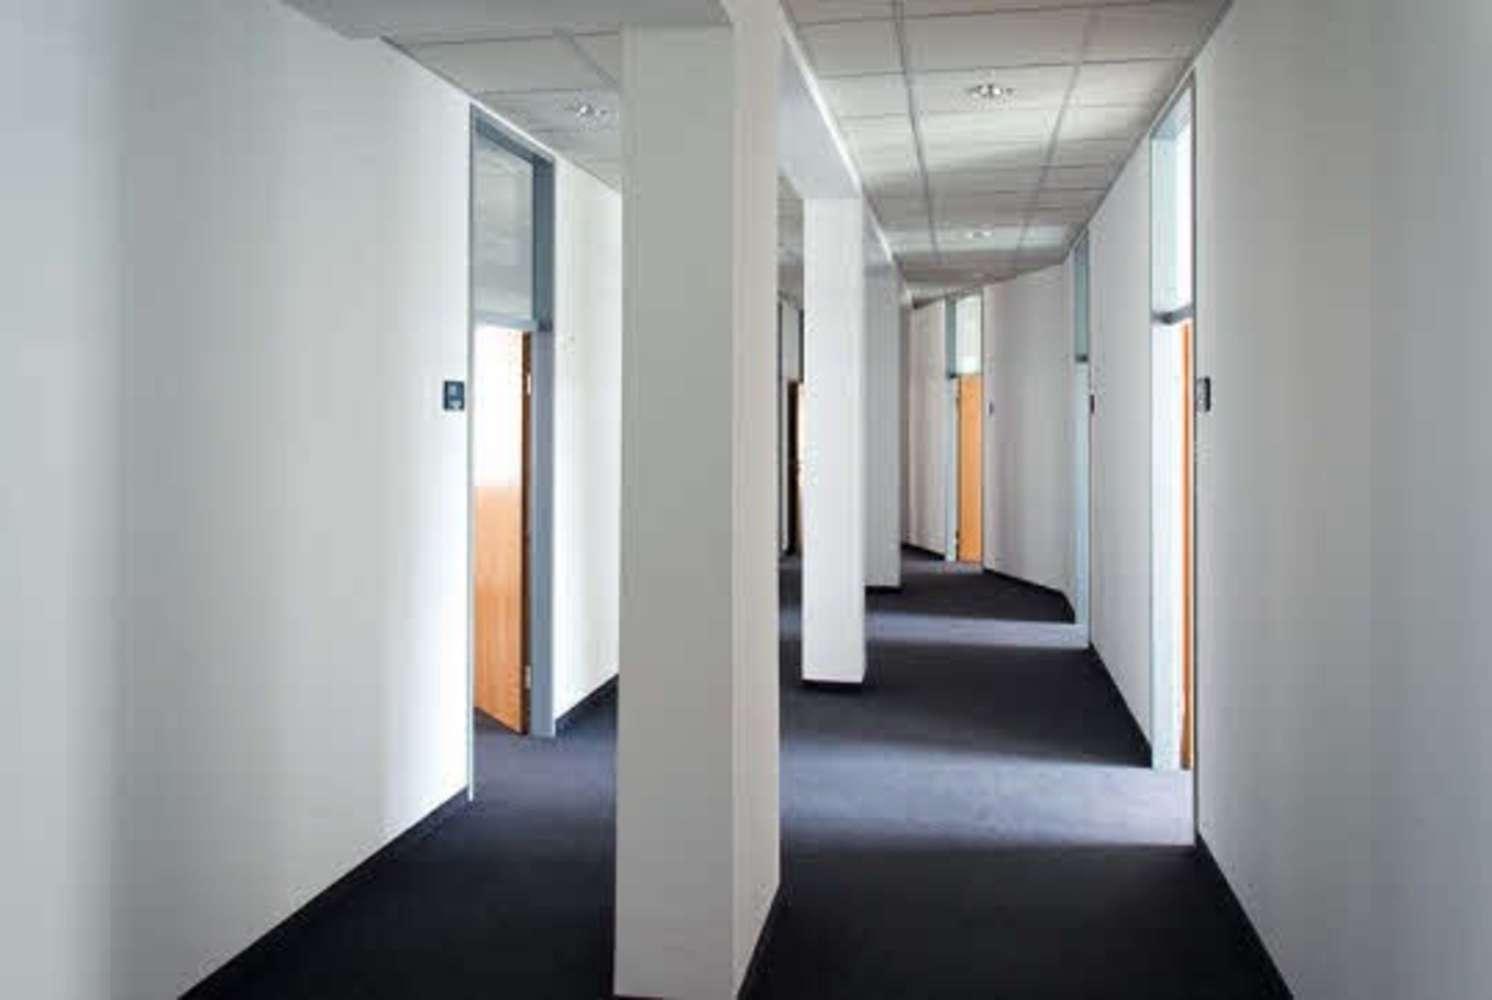 Büros Langen (hessen), 63225 - Büro - Langen (Hessen), Industriegebiet - F0004 - 9406320